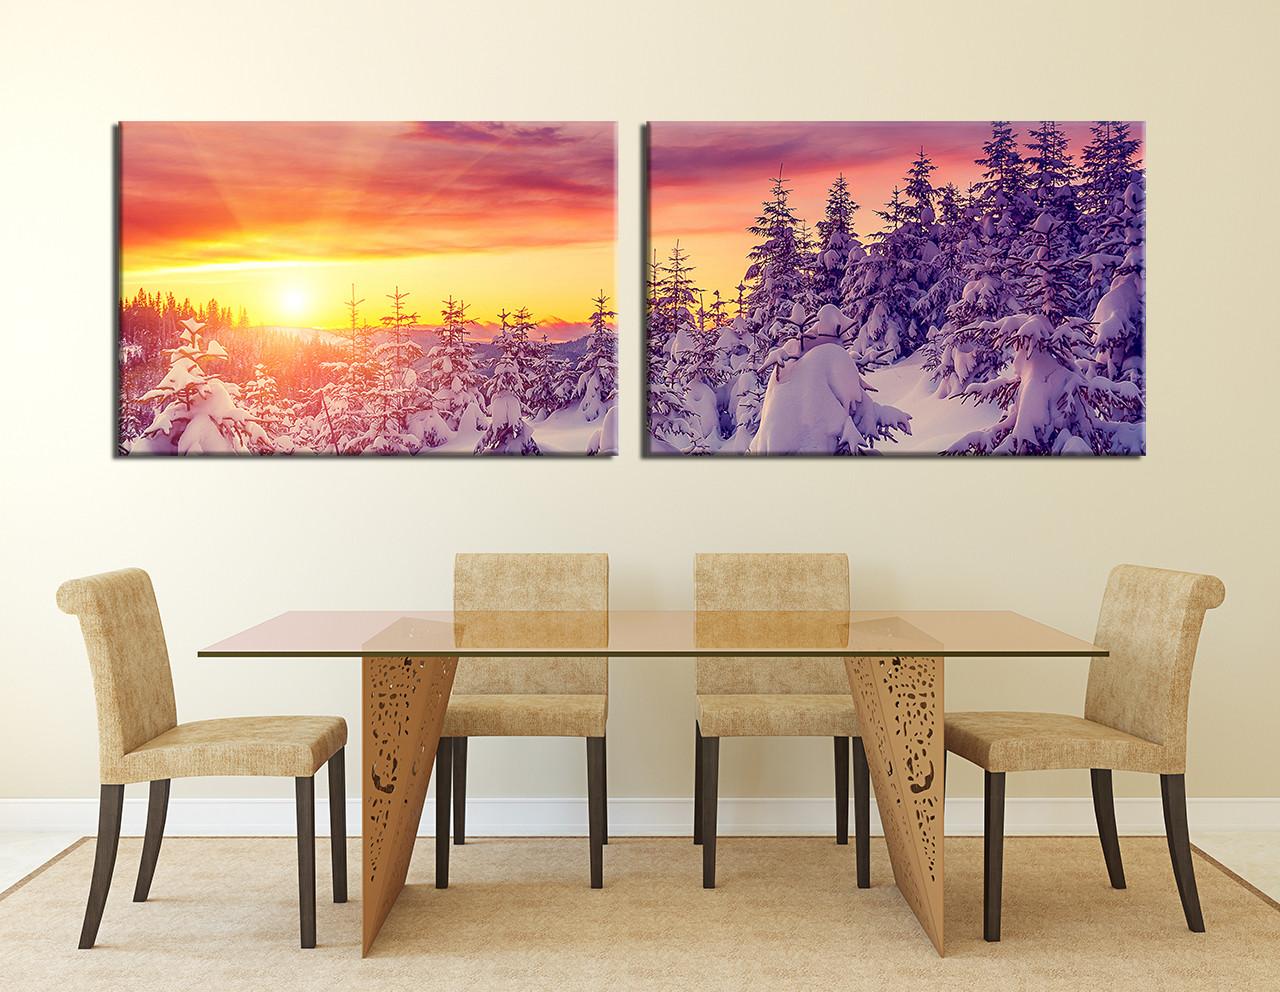 Dining Room Decor, 2 Piece Wall Art, Scenery Multi Panel Art, Scenery  Artwork Part 76